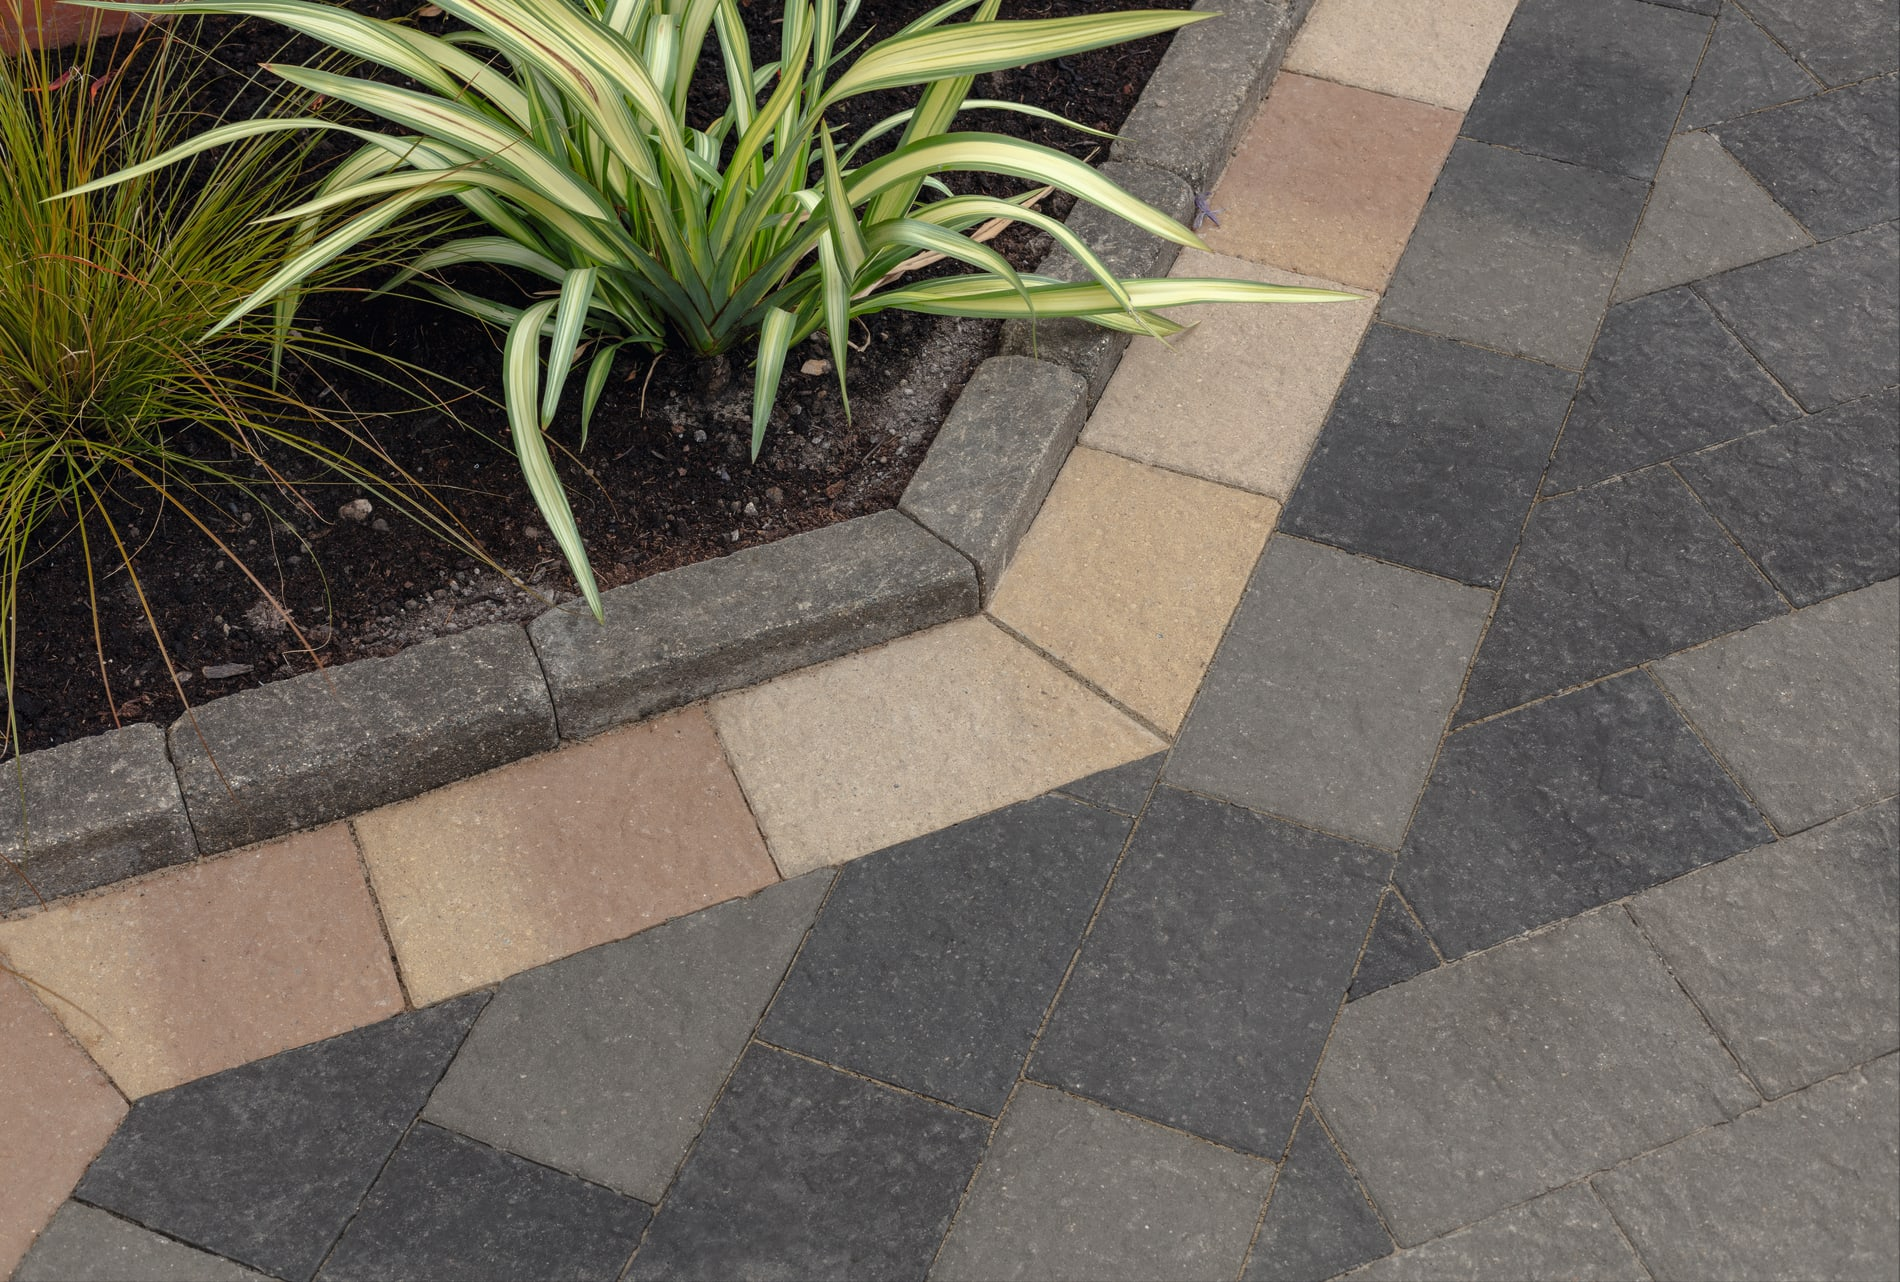 Garden Design Tools Patio Design Software Free Driveway Patio Design Tool Marshalls